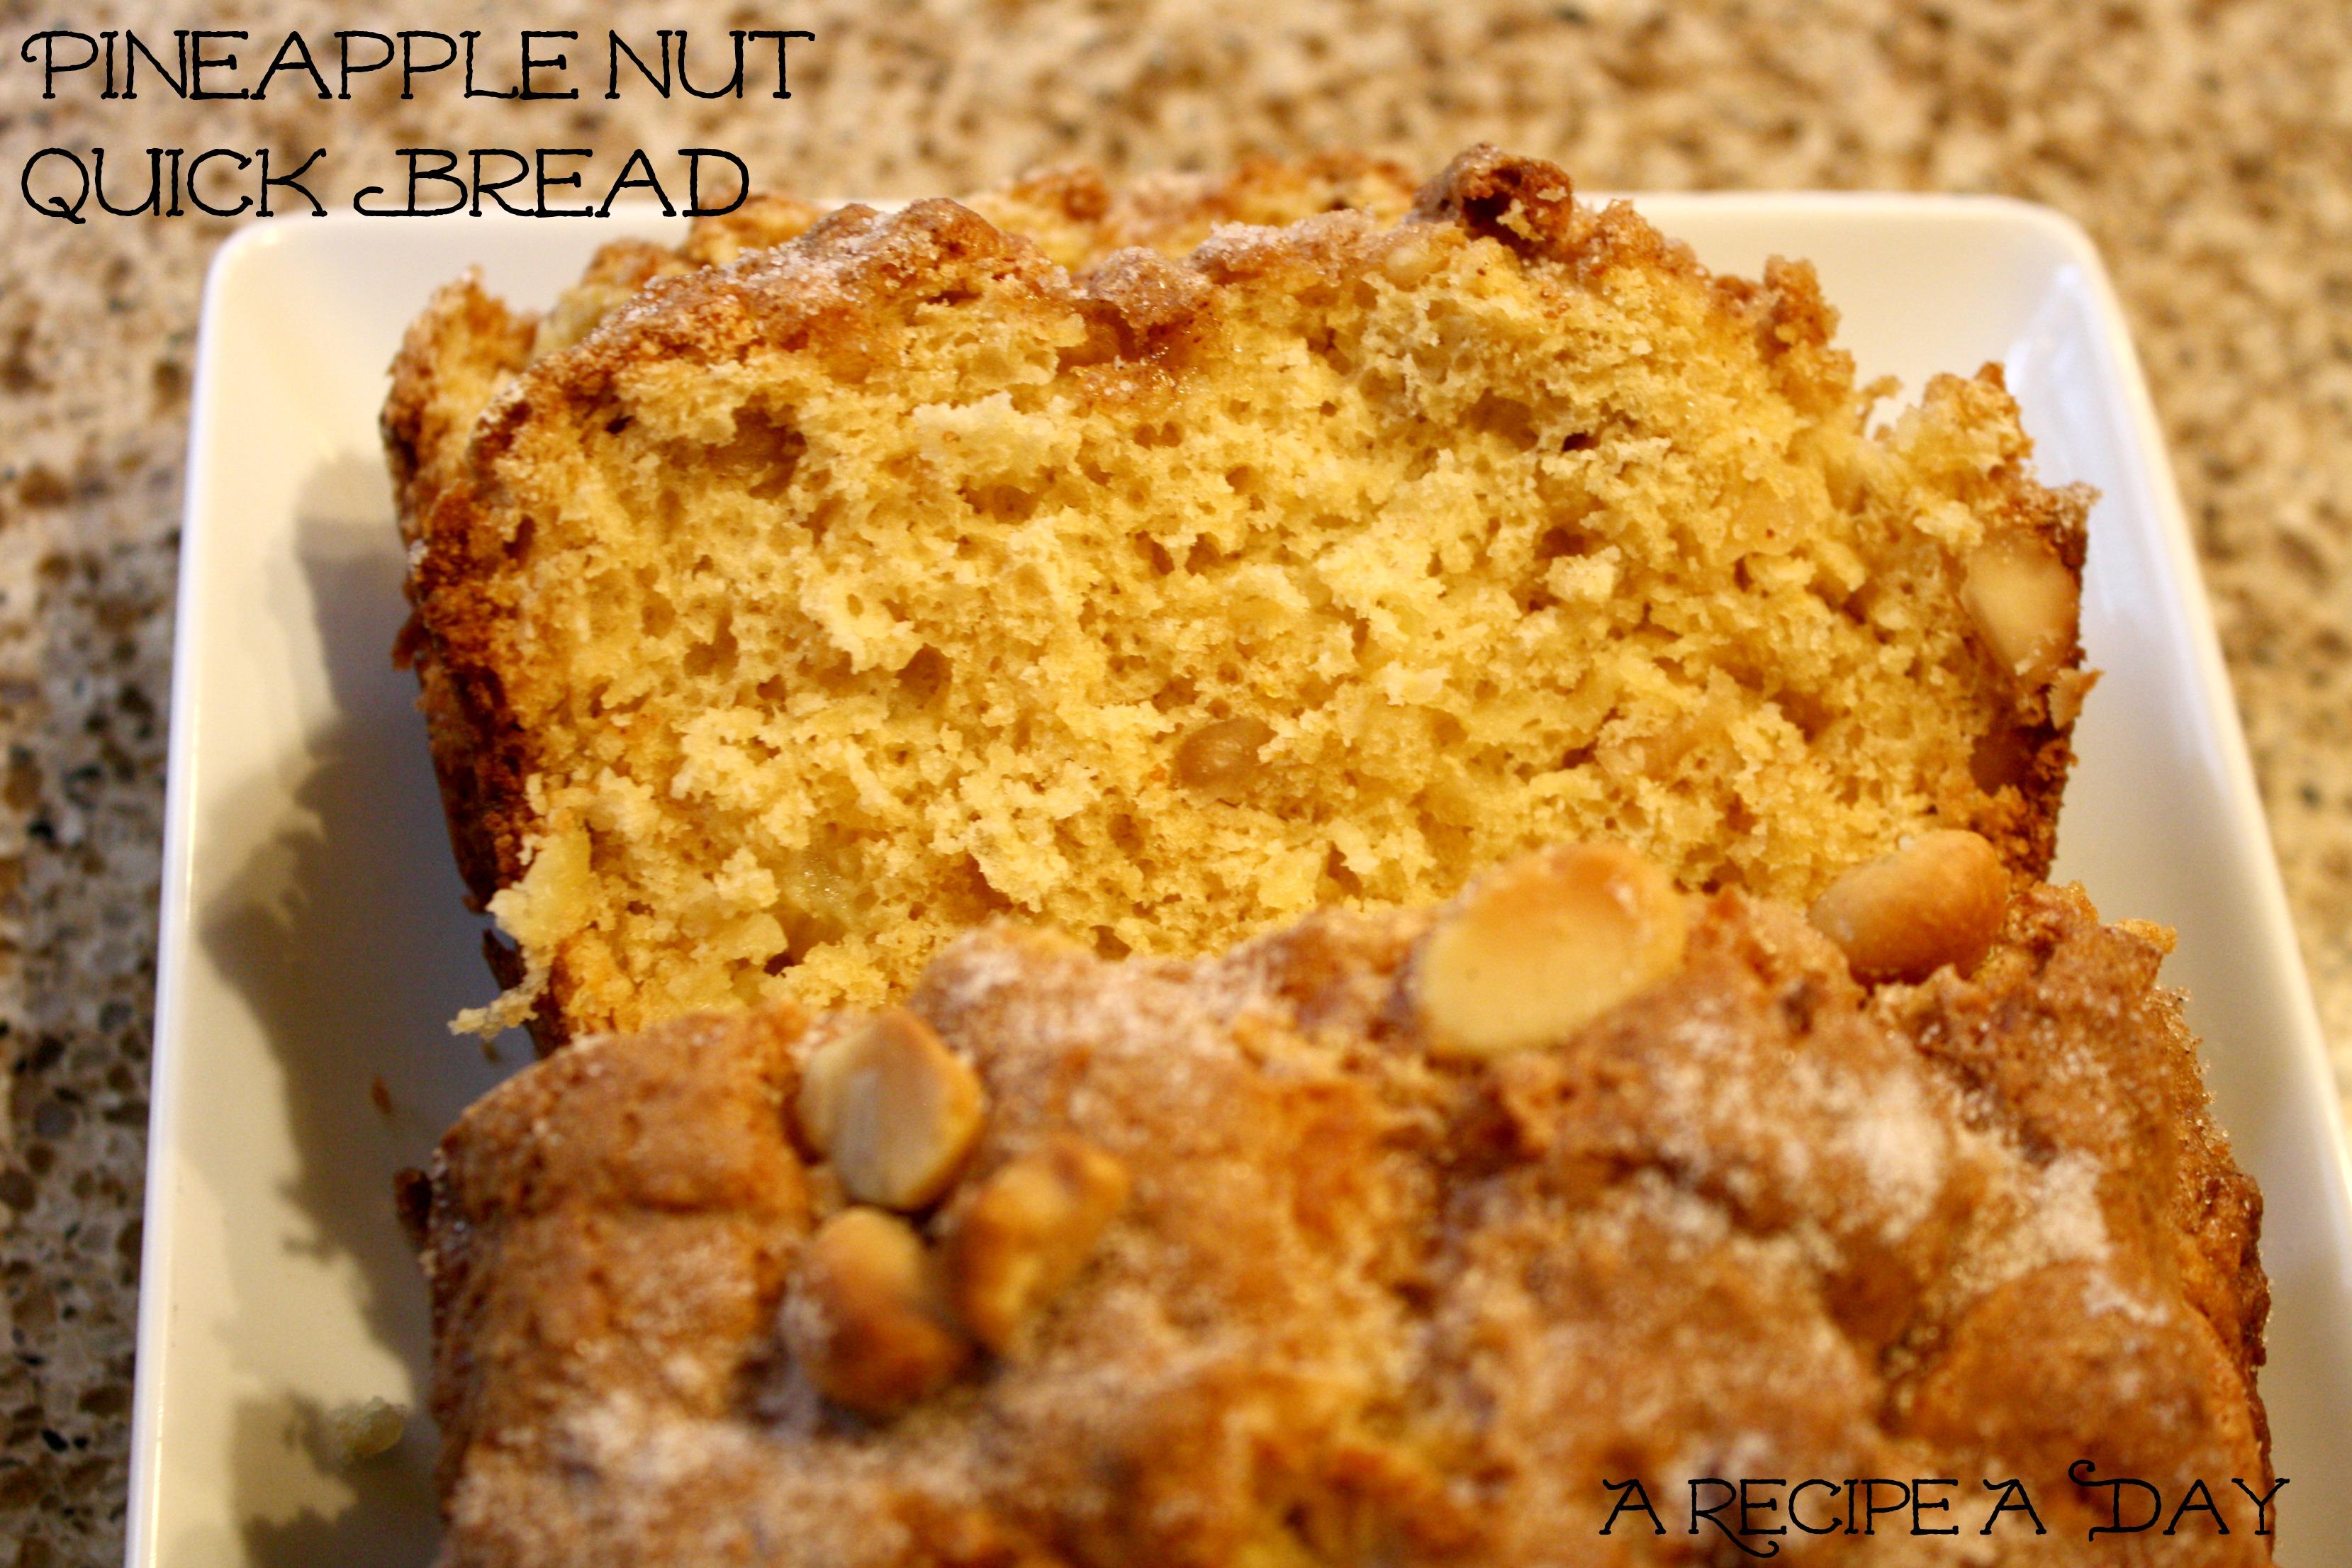 Pineapple Nut Quick Bread 1